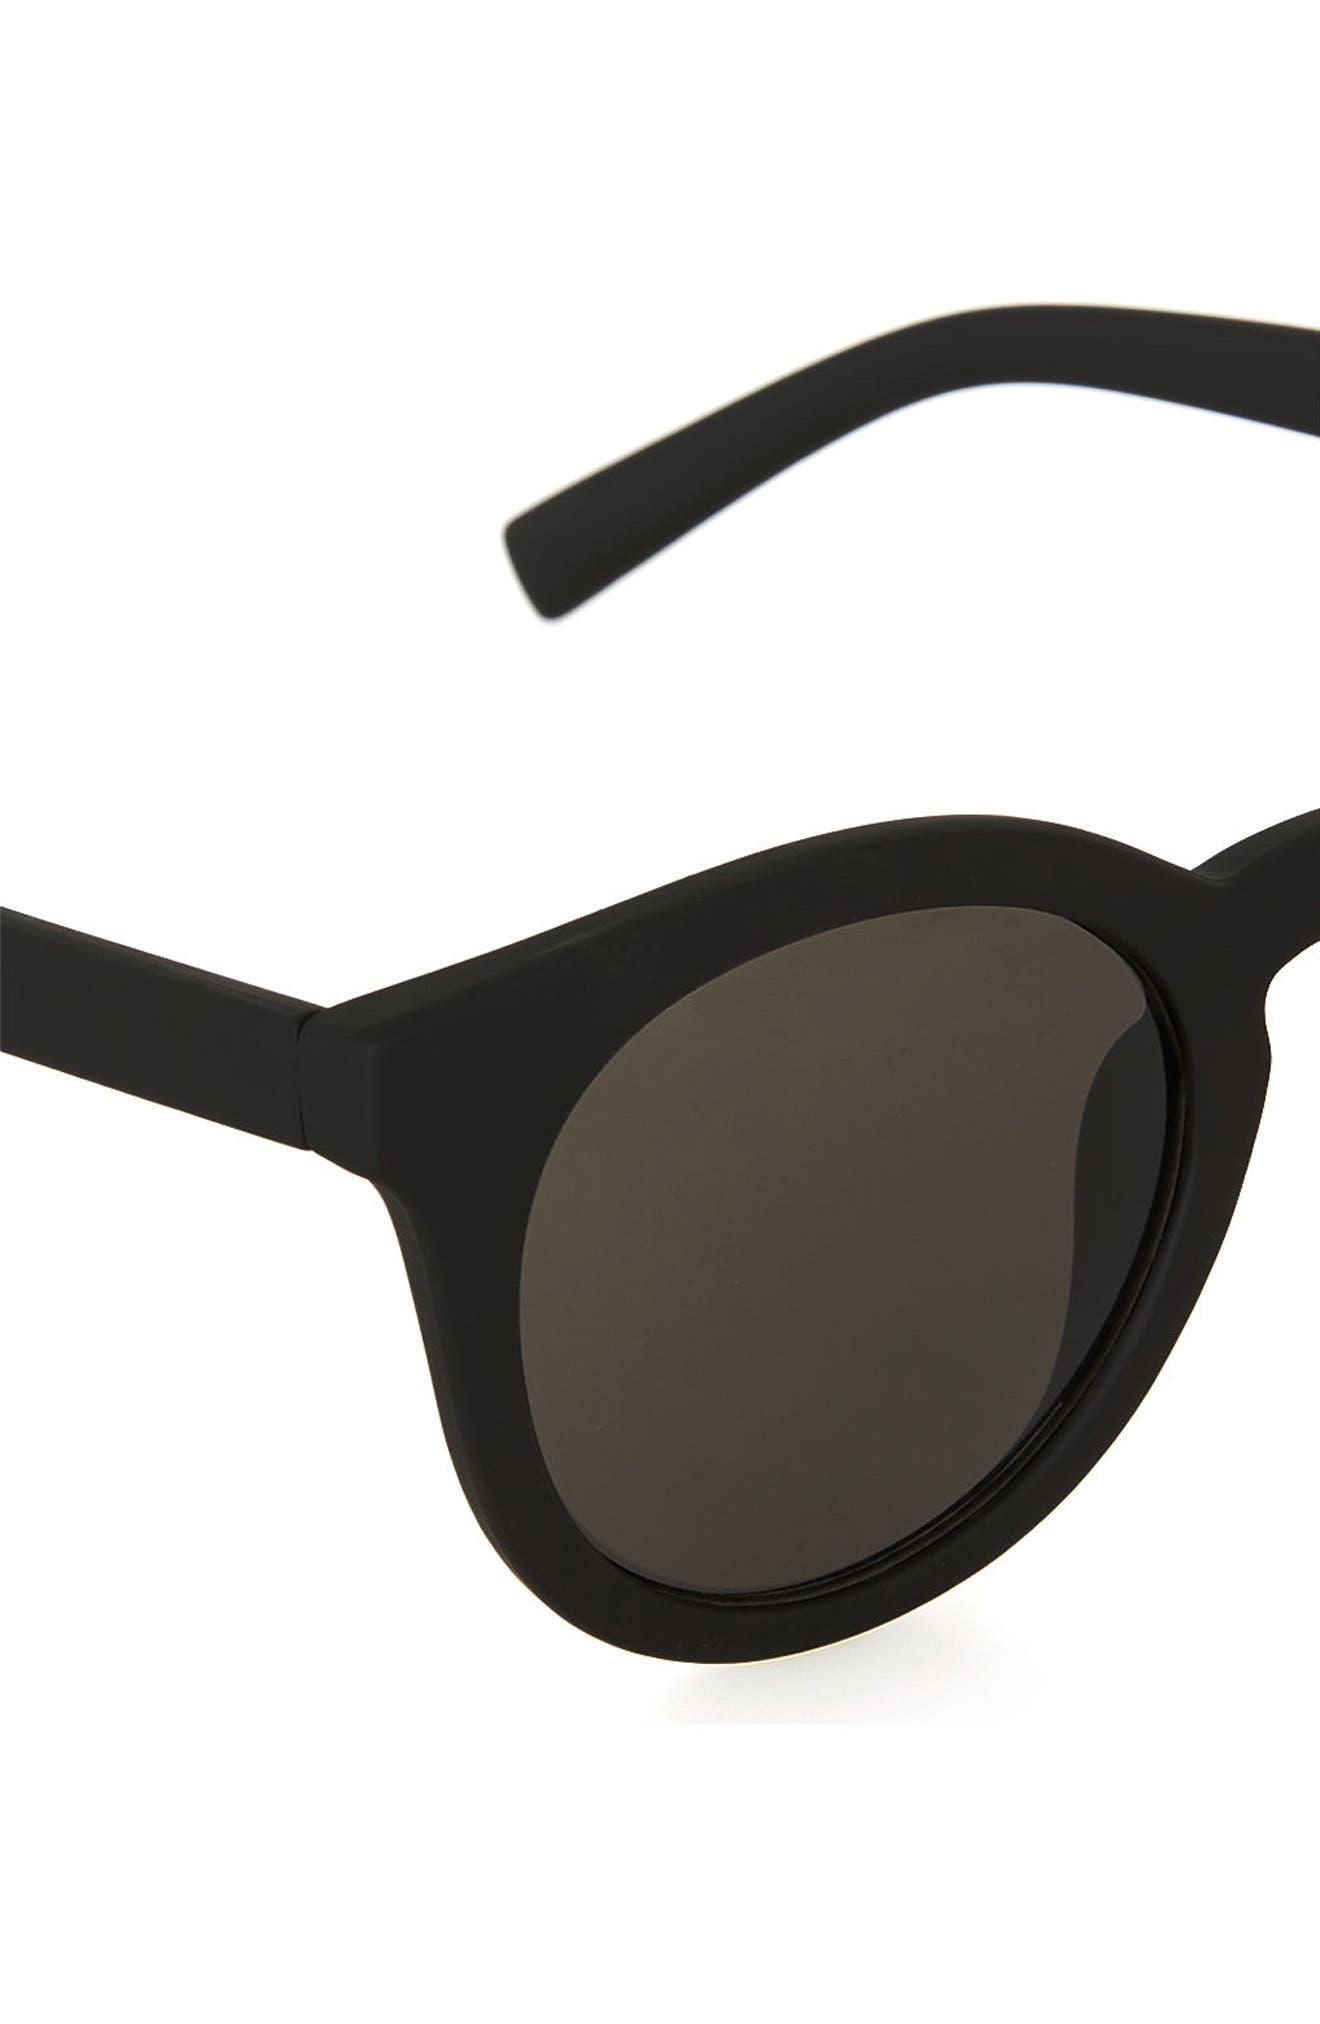 46mm Rubberized Round Sunglasses,                             Alternate thumbnail 2, color,